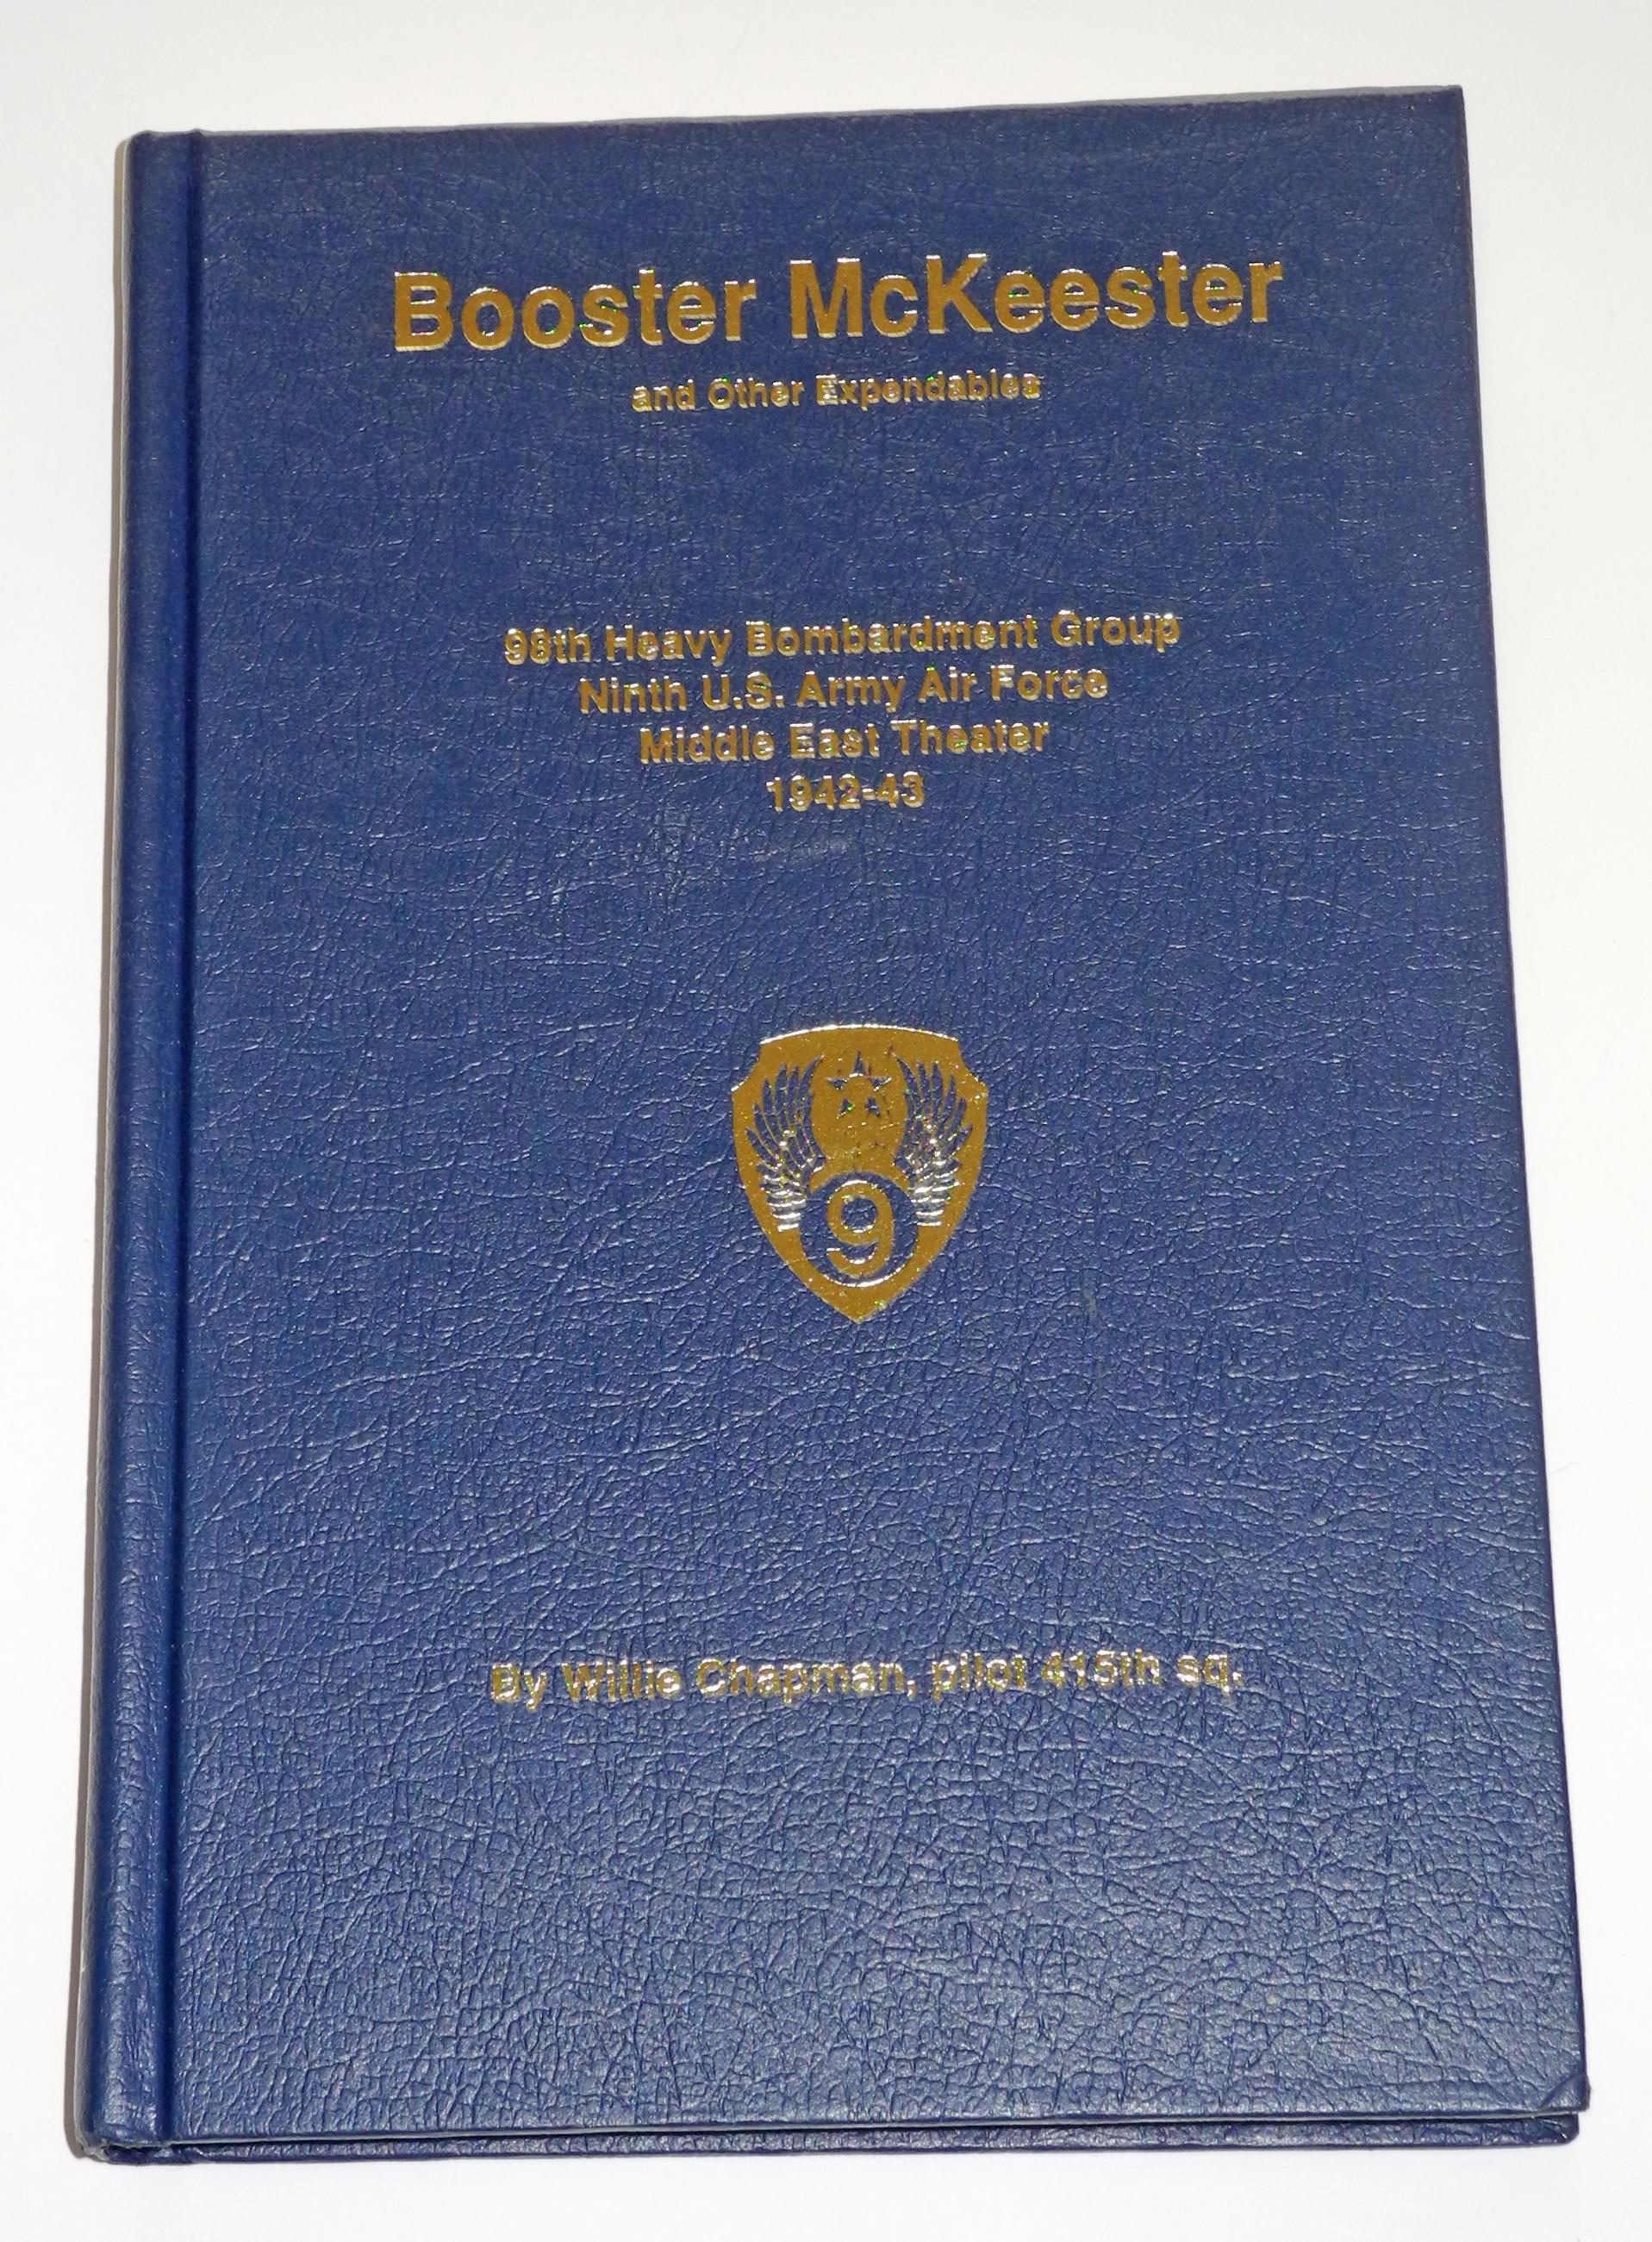 AAF Unit History: Booster McKeester